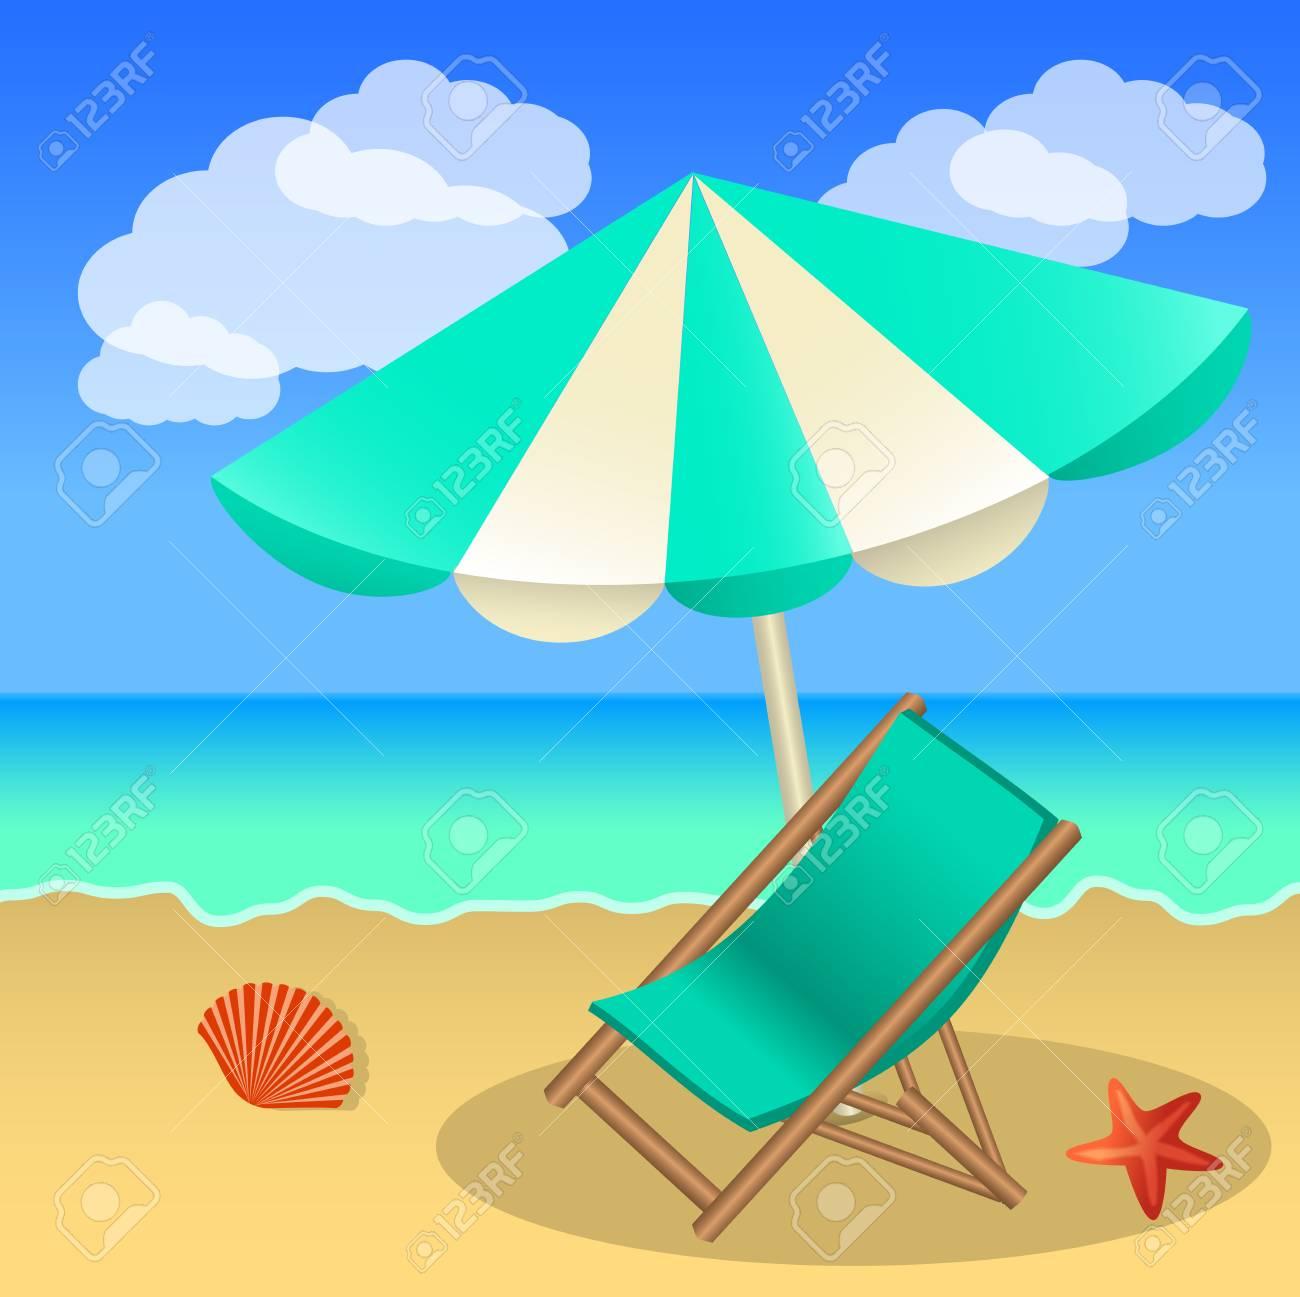 Sand clipart beach umbrella.